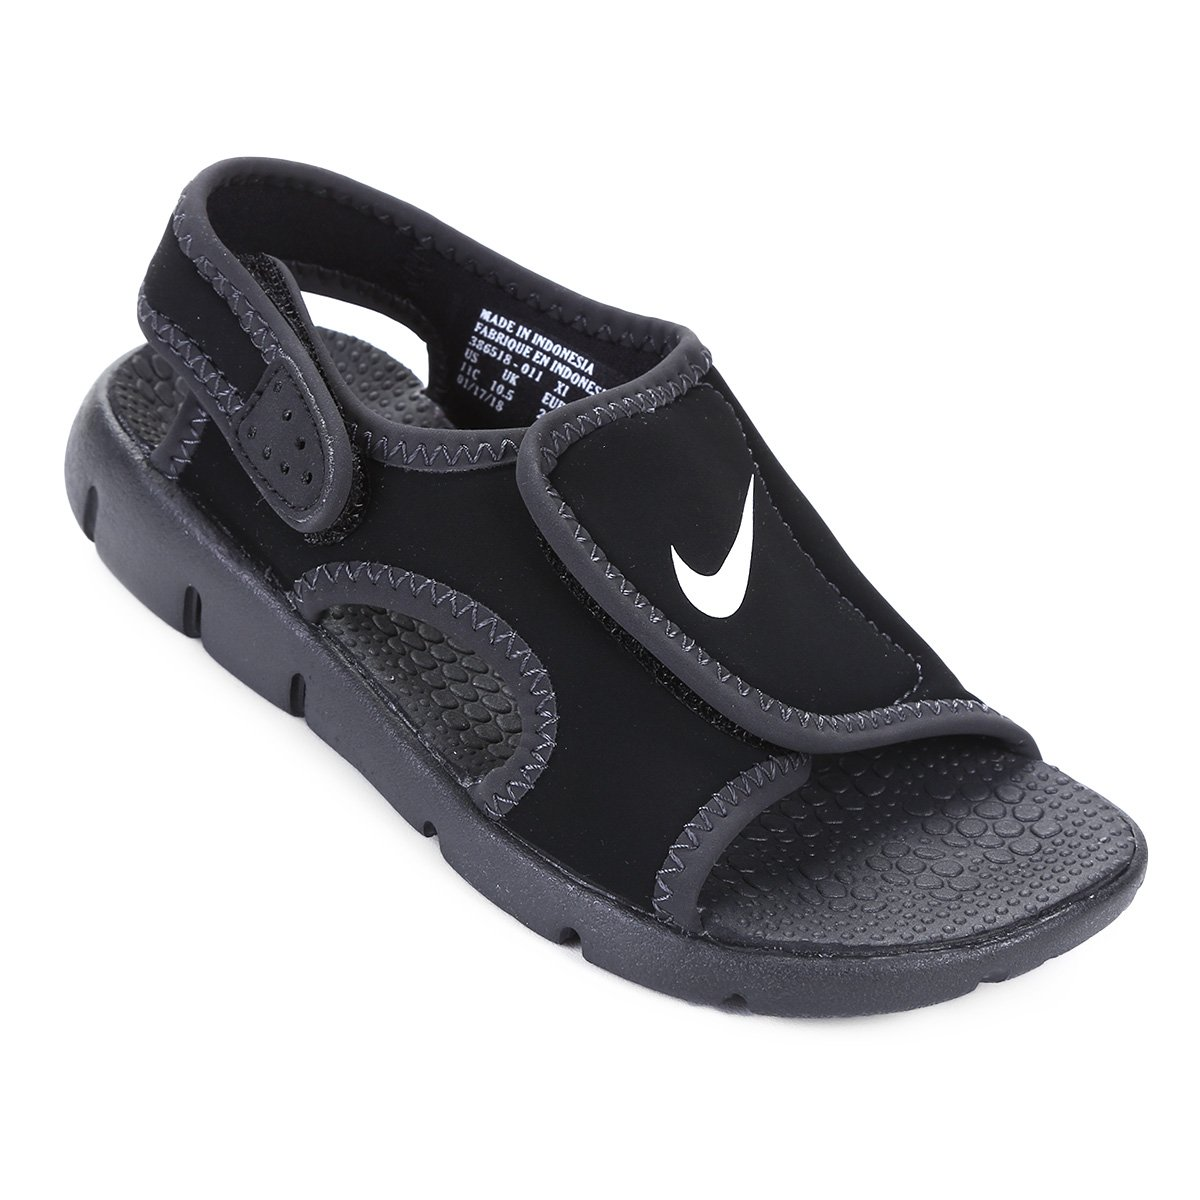 087589404 Sandália Nike Sunray Adjust 4 Juvenil - Preto e Branco | Shop Timão